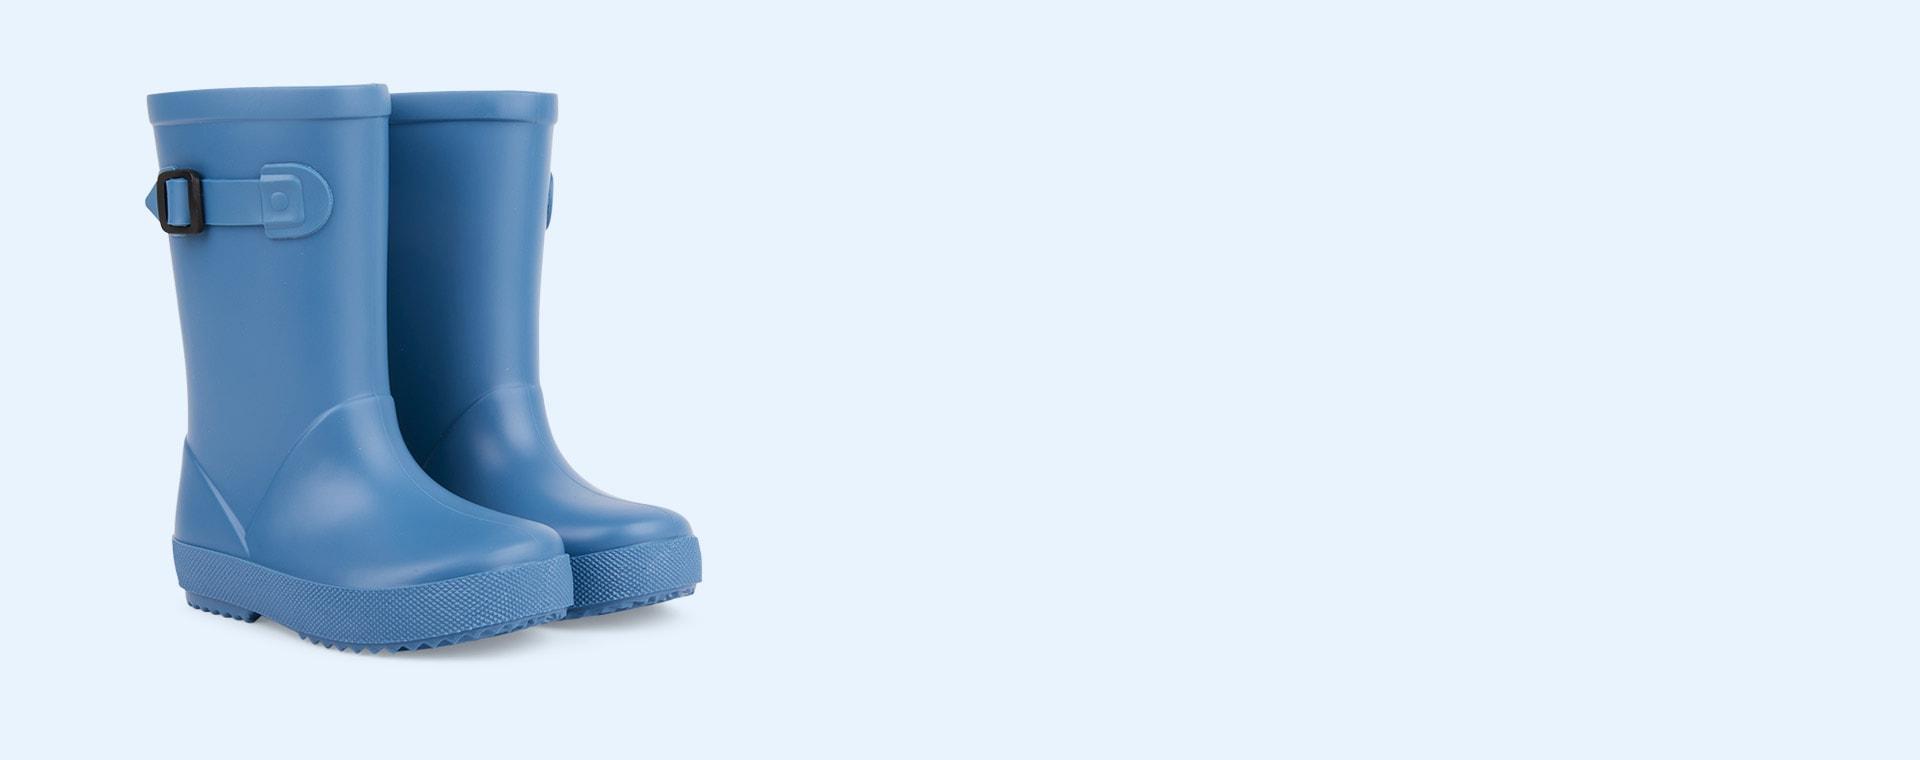 Azul igor Splash Euri Borreguito Welly